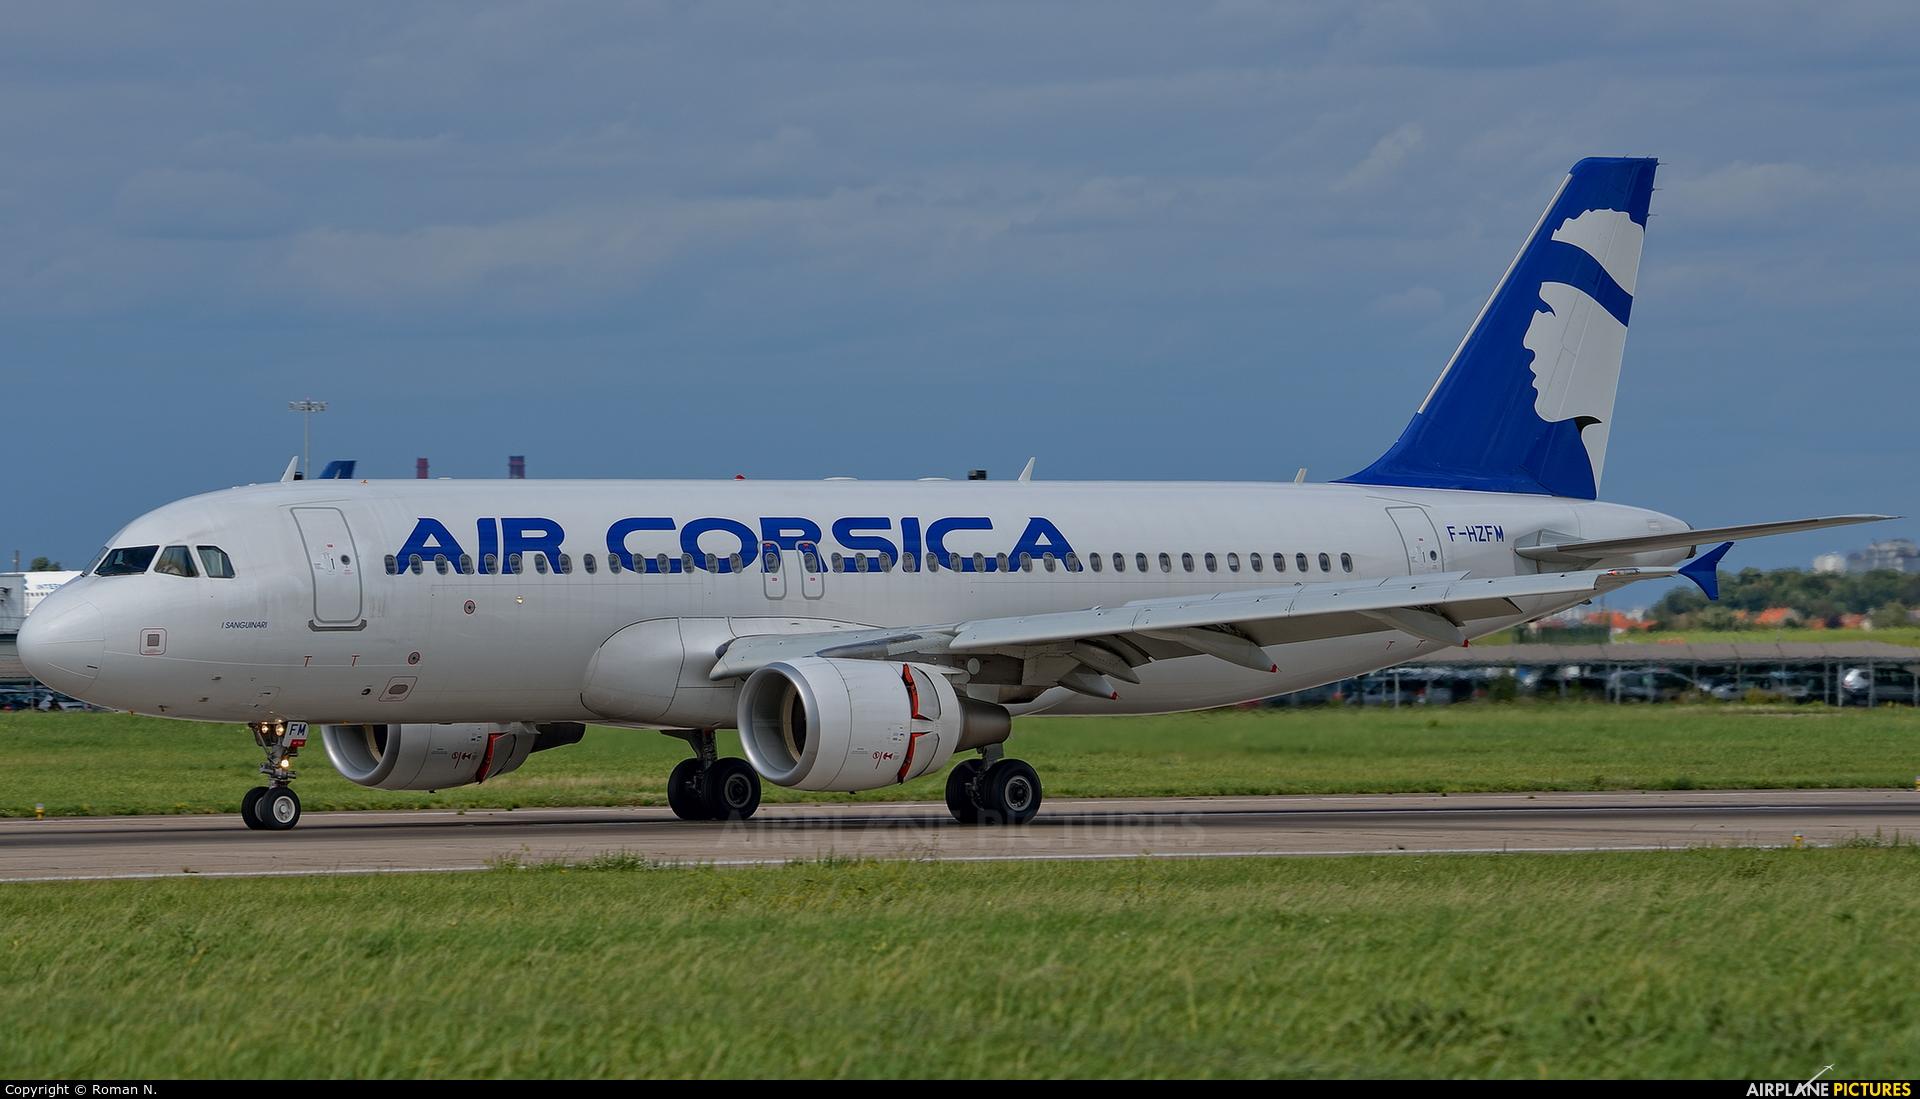 Air Corsica F-HZFM aircraft at Paris - Orly